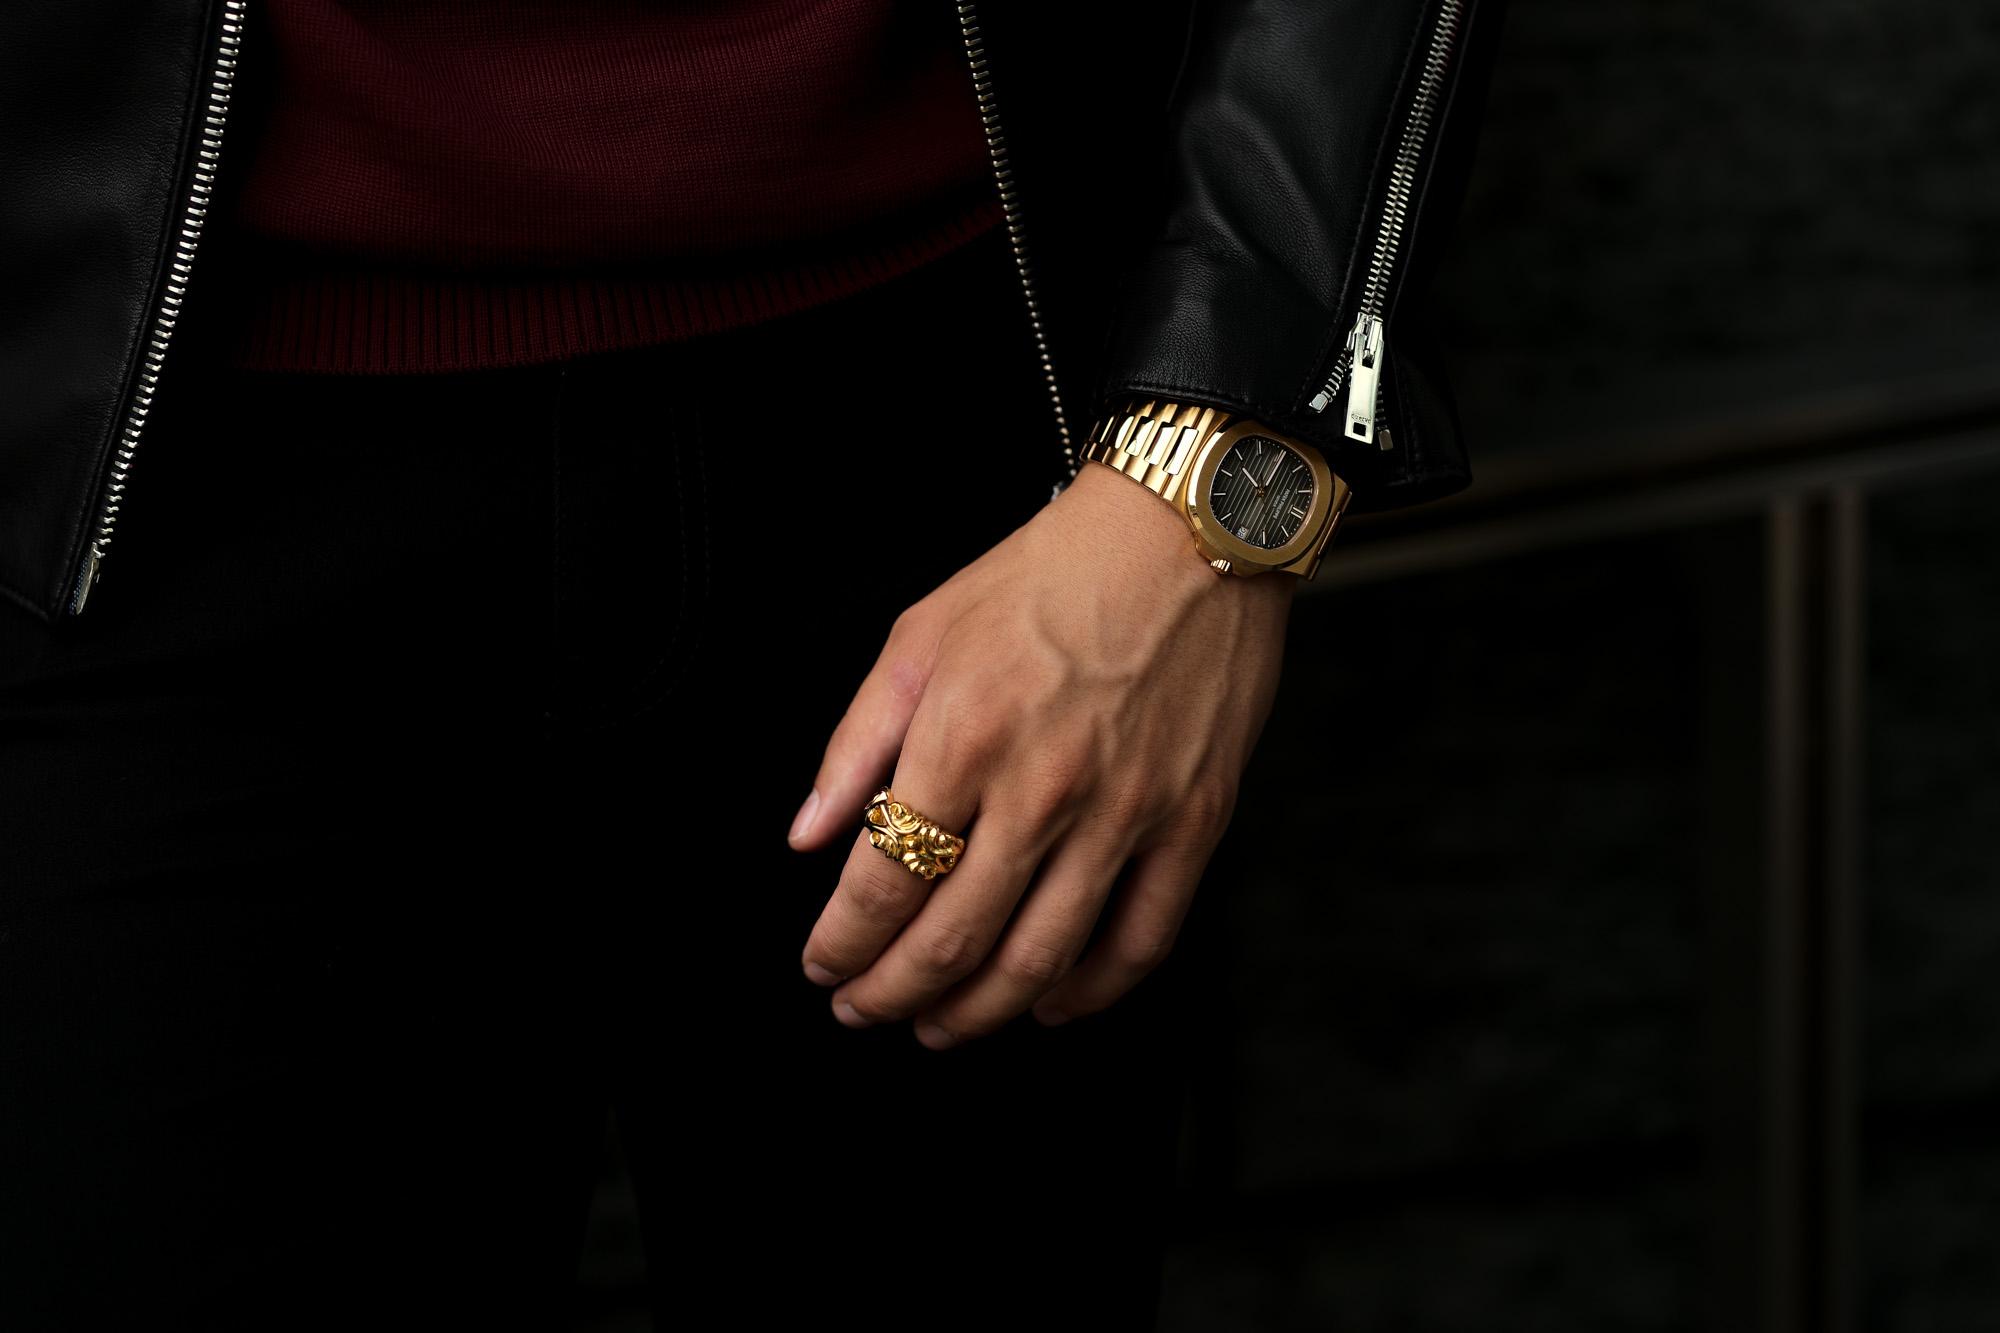 Balvenie Wilhelm (バルヴェニー ヴィルヘルム) VALIANT RING 22K GOLD ヴァリアント リング GOLD (ゴールド) Made In England (イギリス製) 【Special Special Special Model】 愛知 名古屋 Alto e Diritto altoediritto アルトエデリット スペシャルリング ゴールドリング 指輪 RING PATEK PHILIPPE ノーチラス 5711/1R ローズゴールド パテックフィリップ